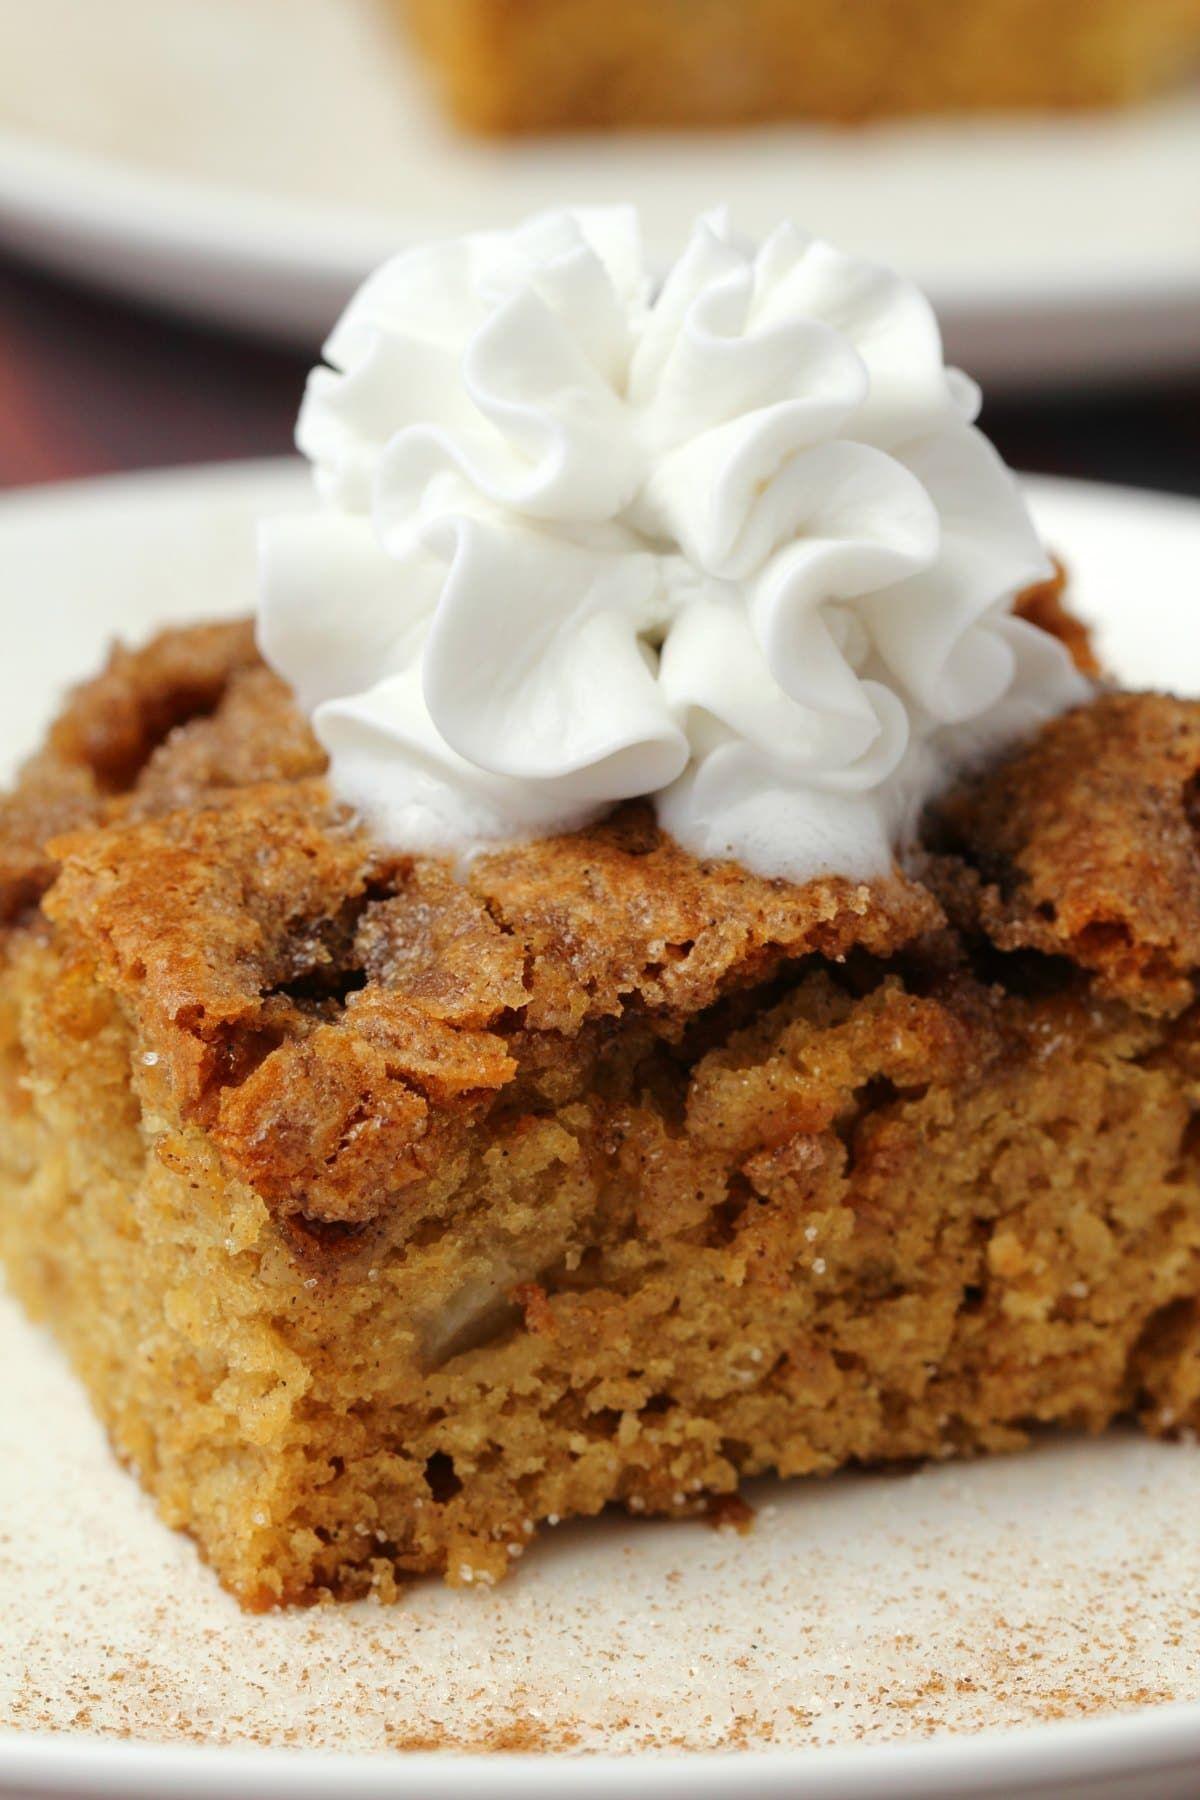 Light and fluffy vegan apple cake with a cinnamon sugar